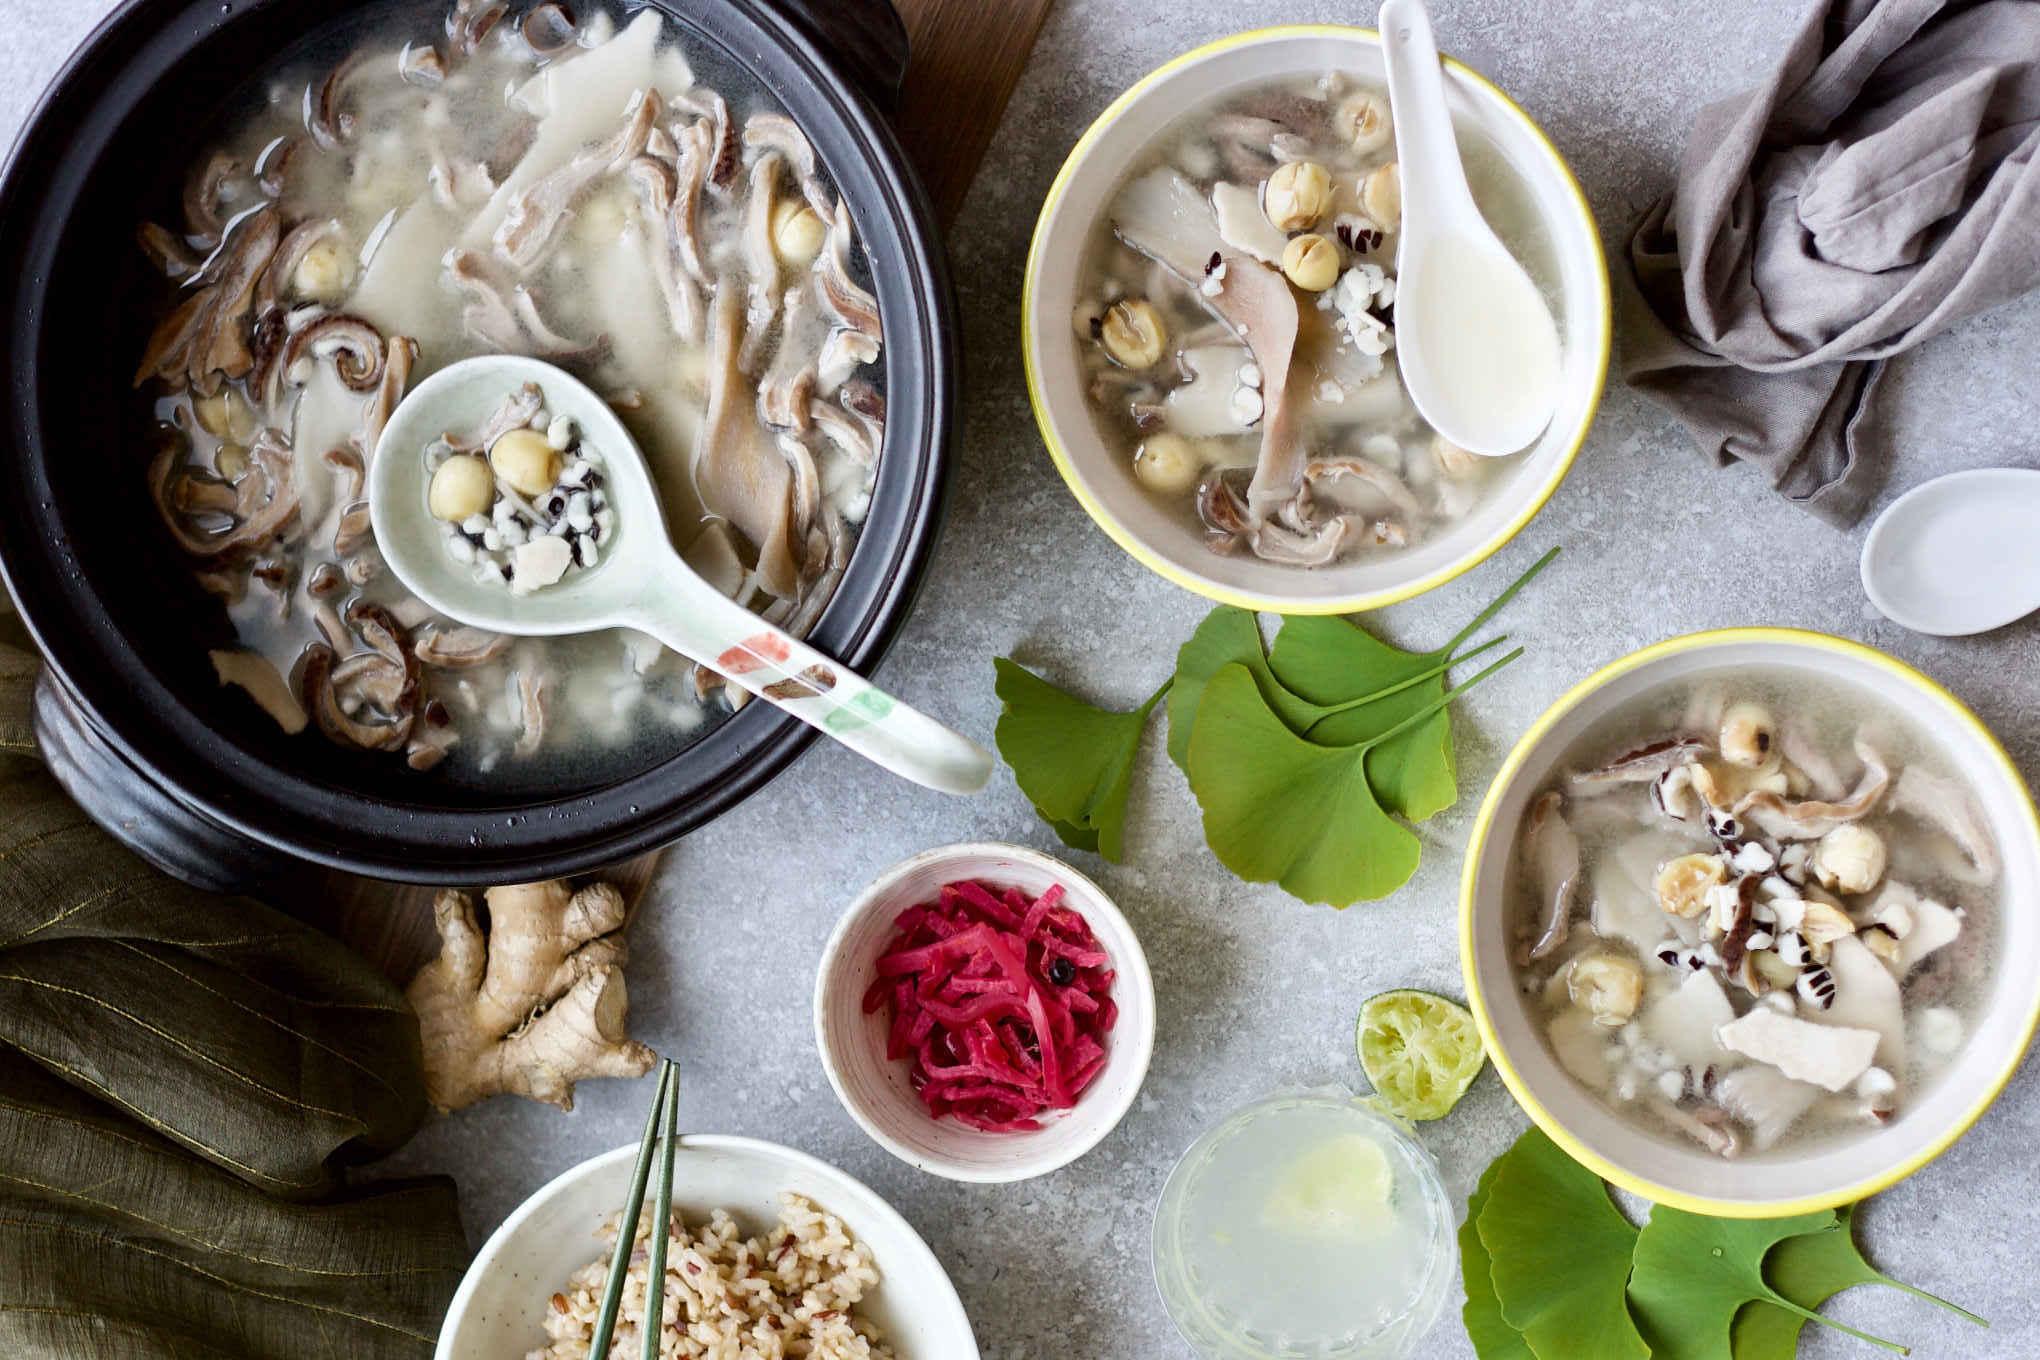 Yang S Kitchen